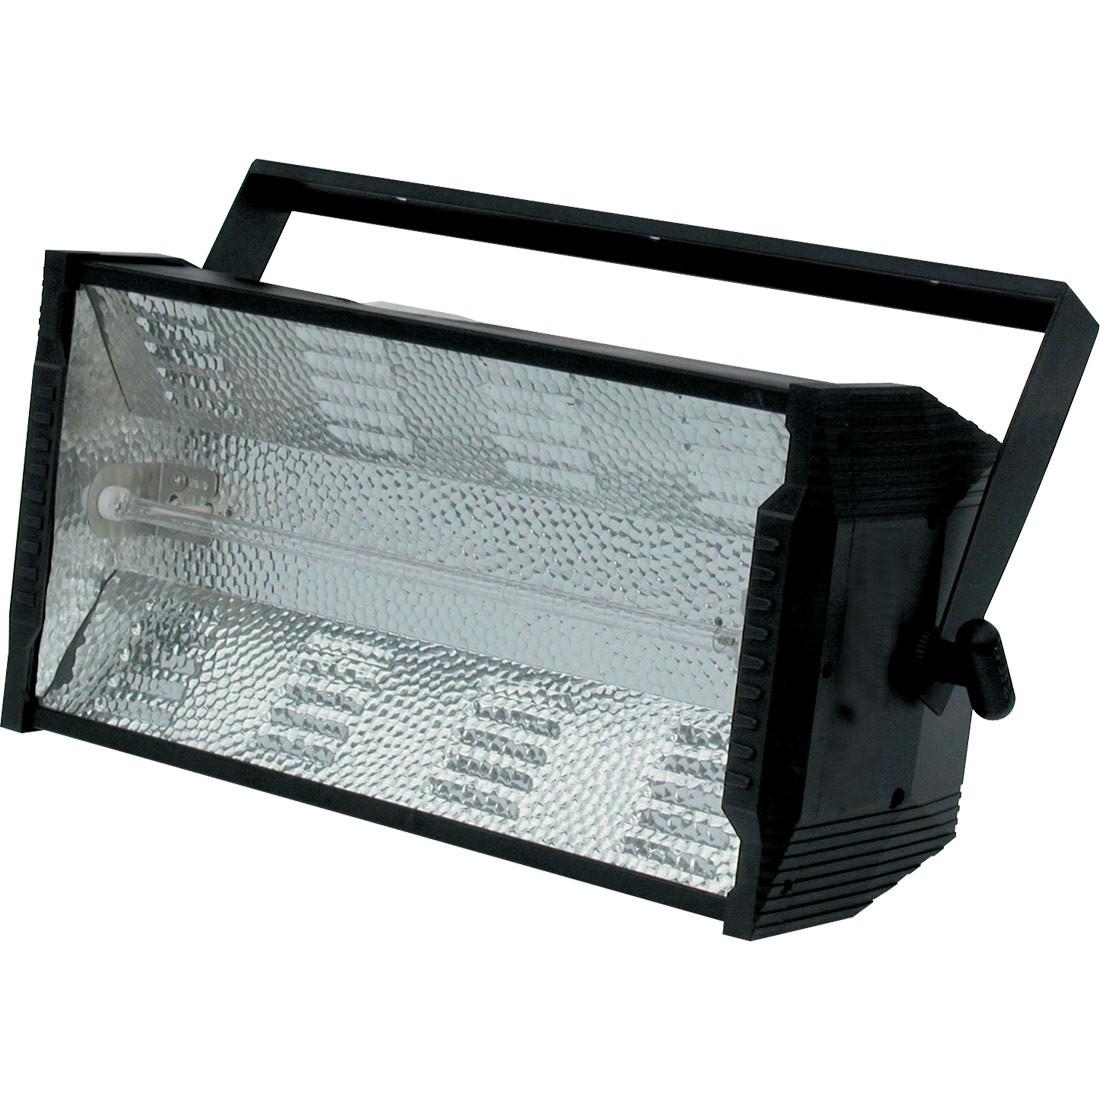 hight resolution of sp 1500 dmx strobe product archive light lights